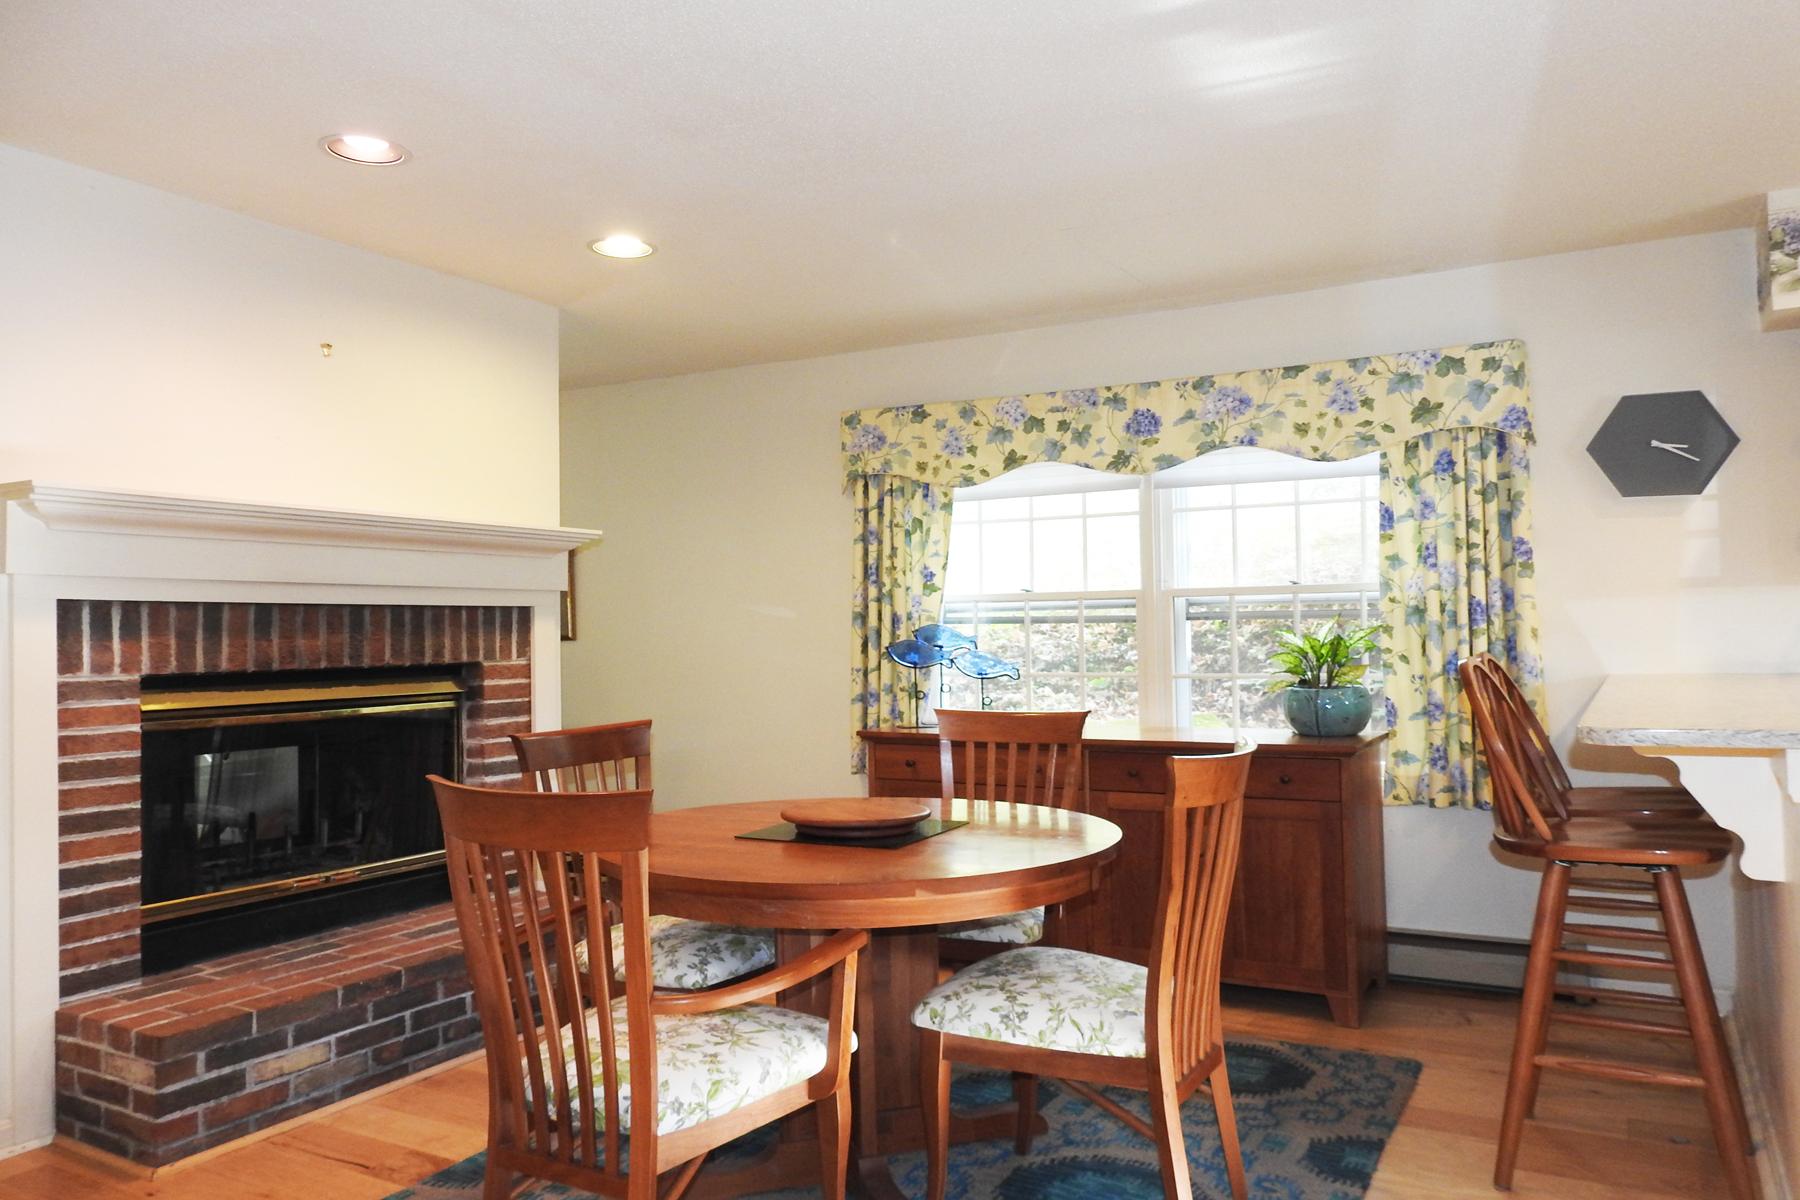 condominiums for Sale at Country Grove Condo 300 Grove Unit 21 St Rutland, Vermont 05701 United States